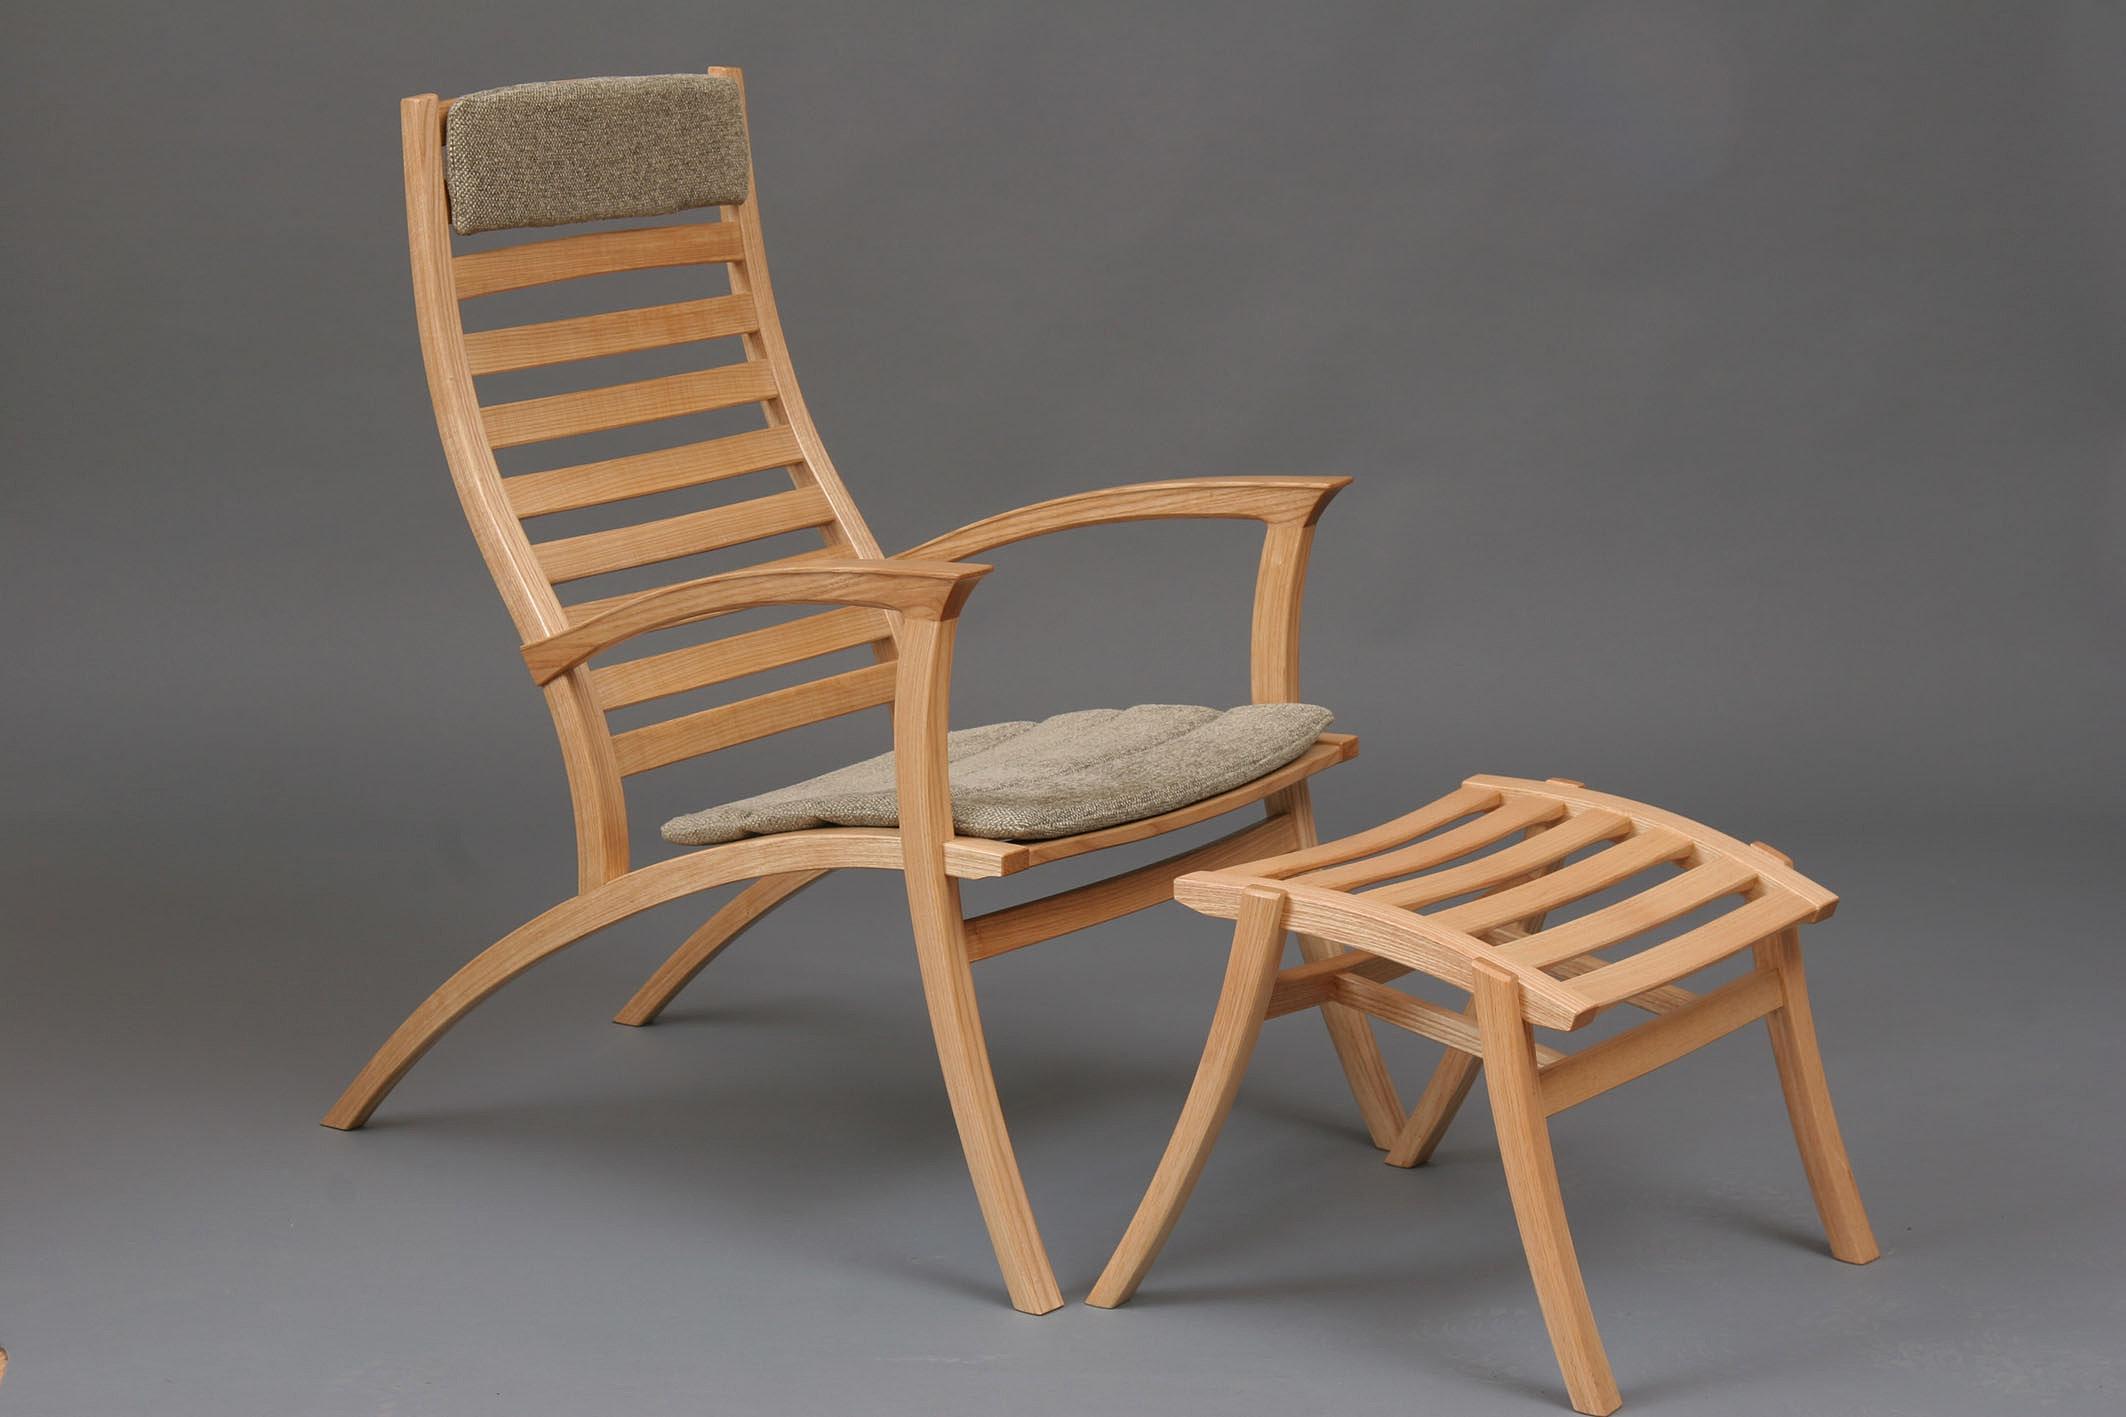 Awesome Fingerprint Furniture By Fingerprint Furniture Koehnen Chair No 1 ...